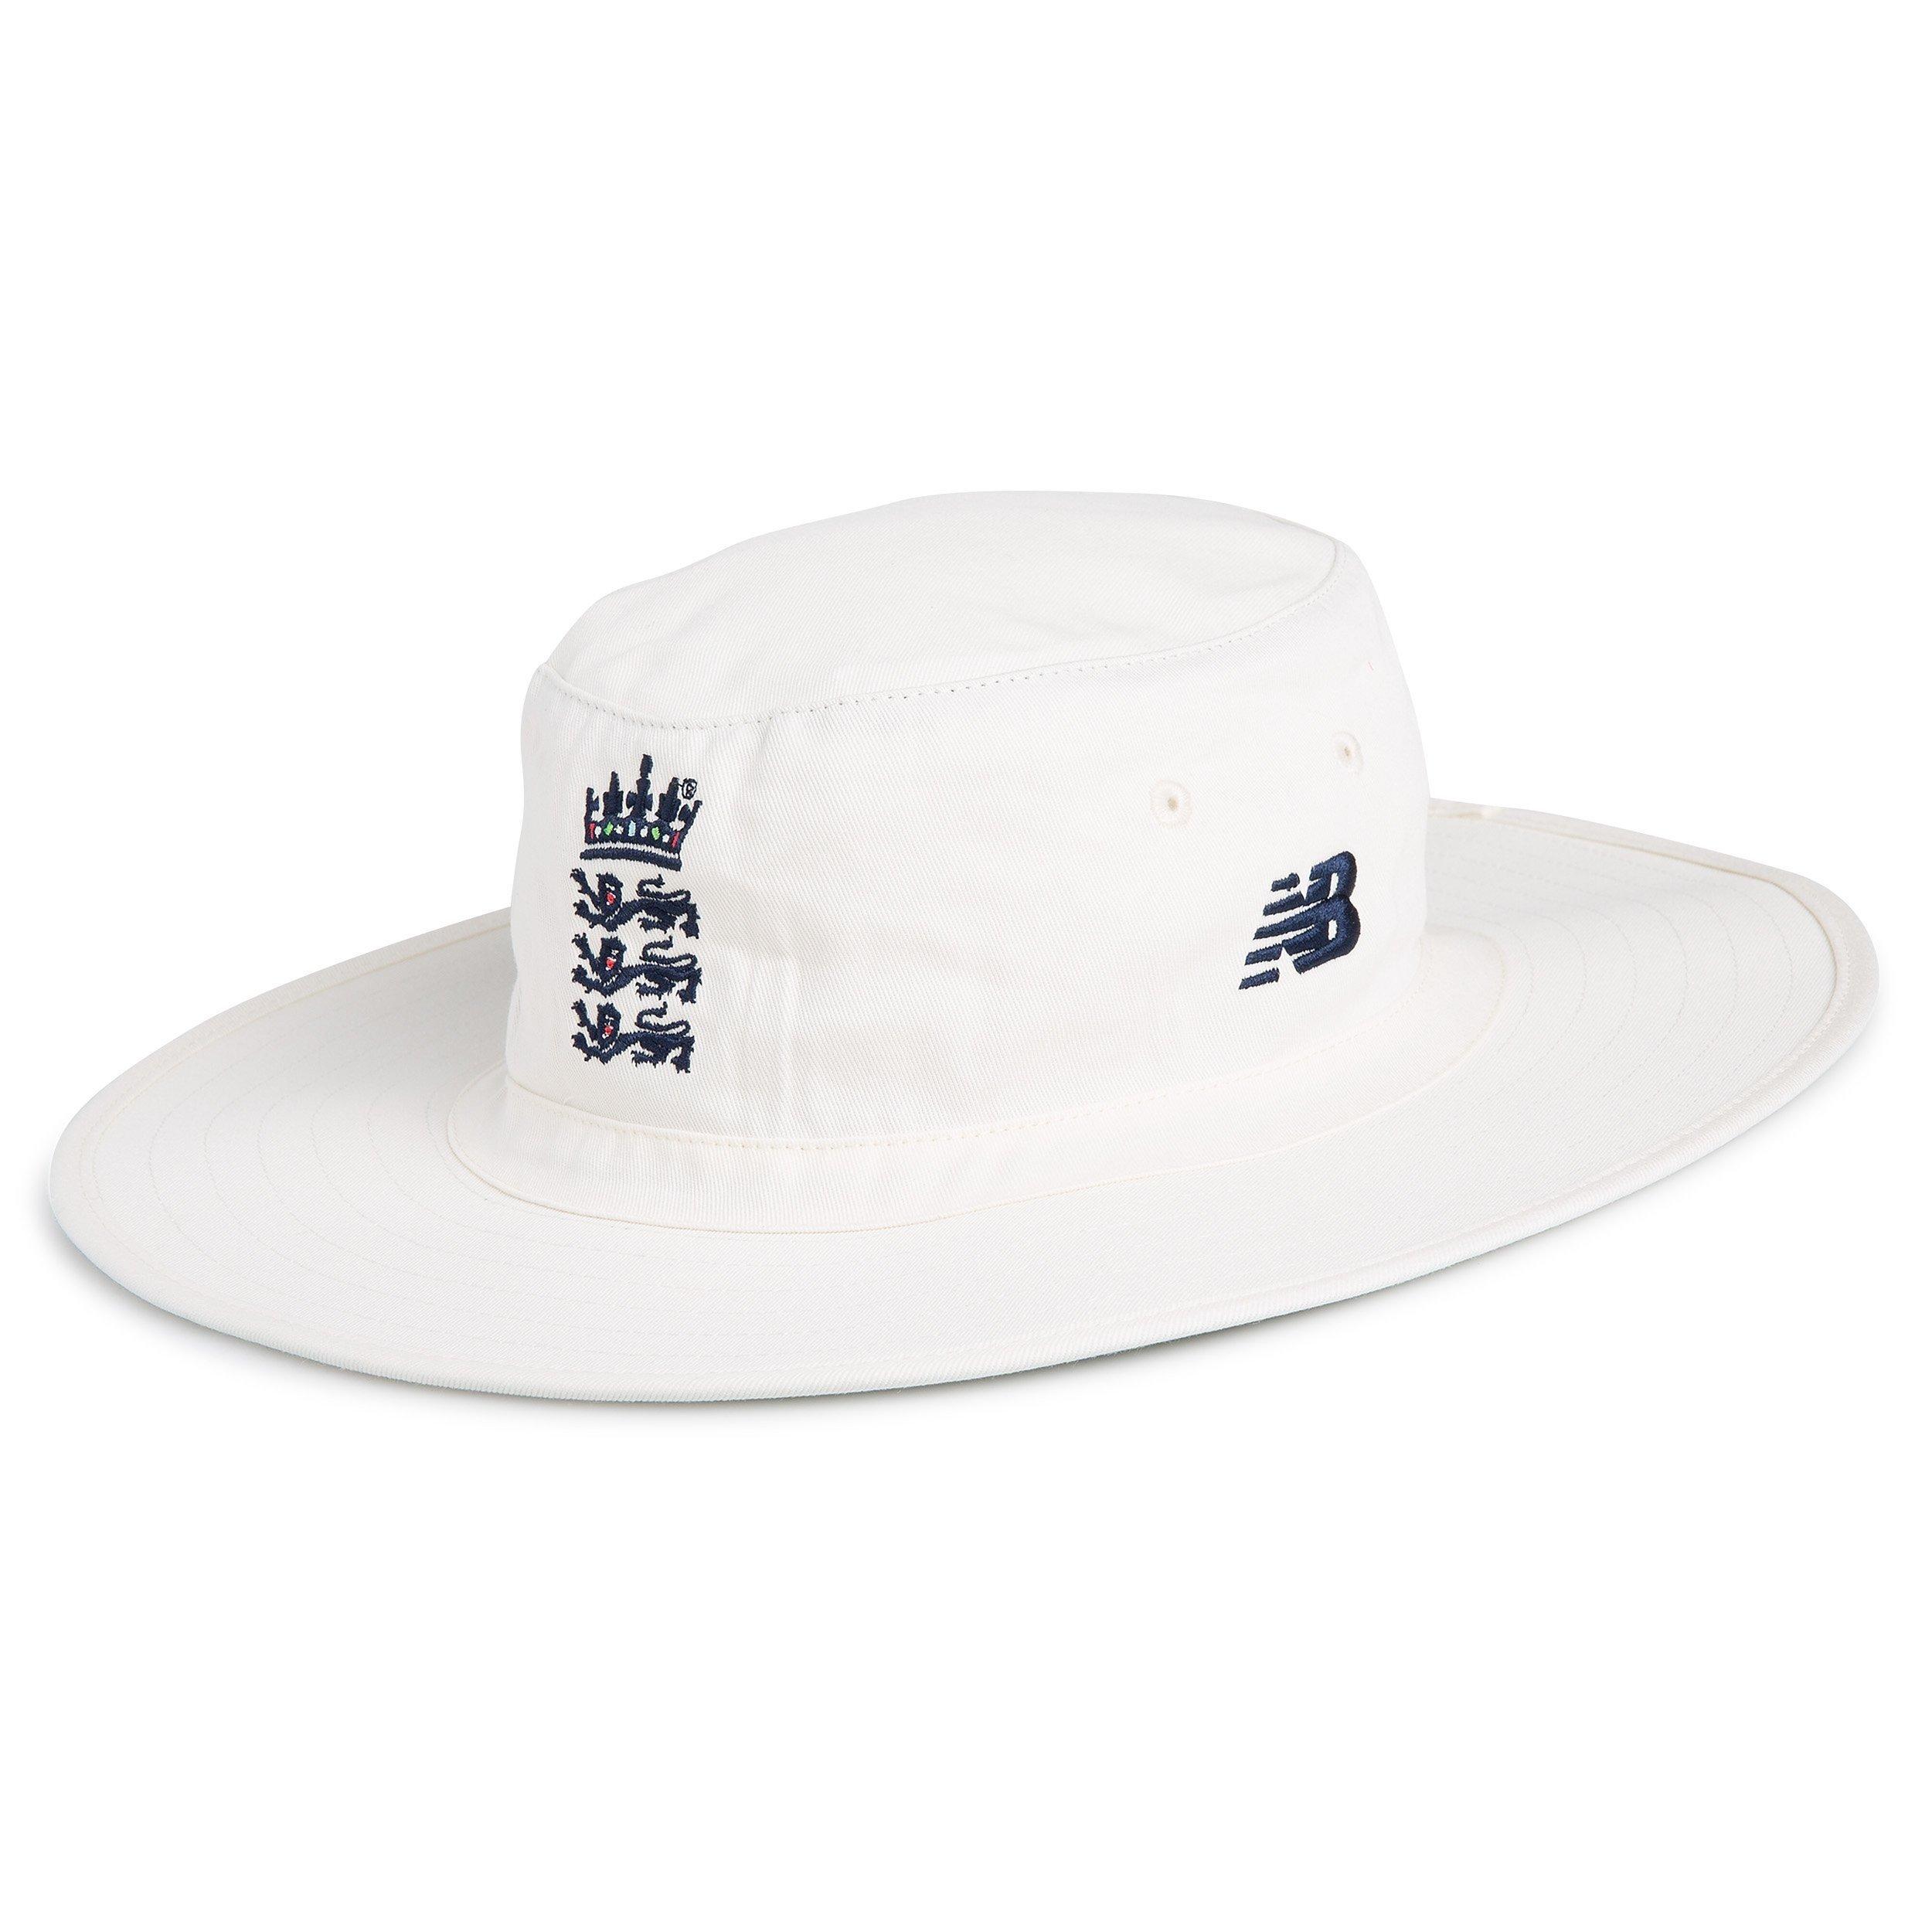 2019 New Balance England Test Cricket Sunhat